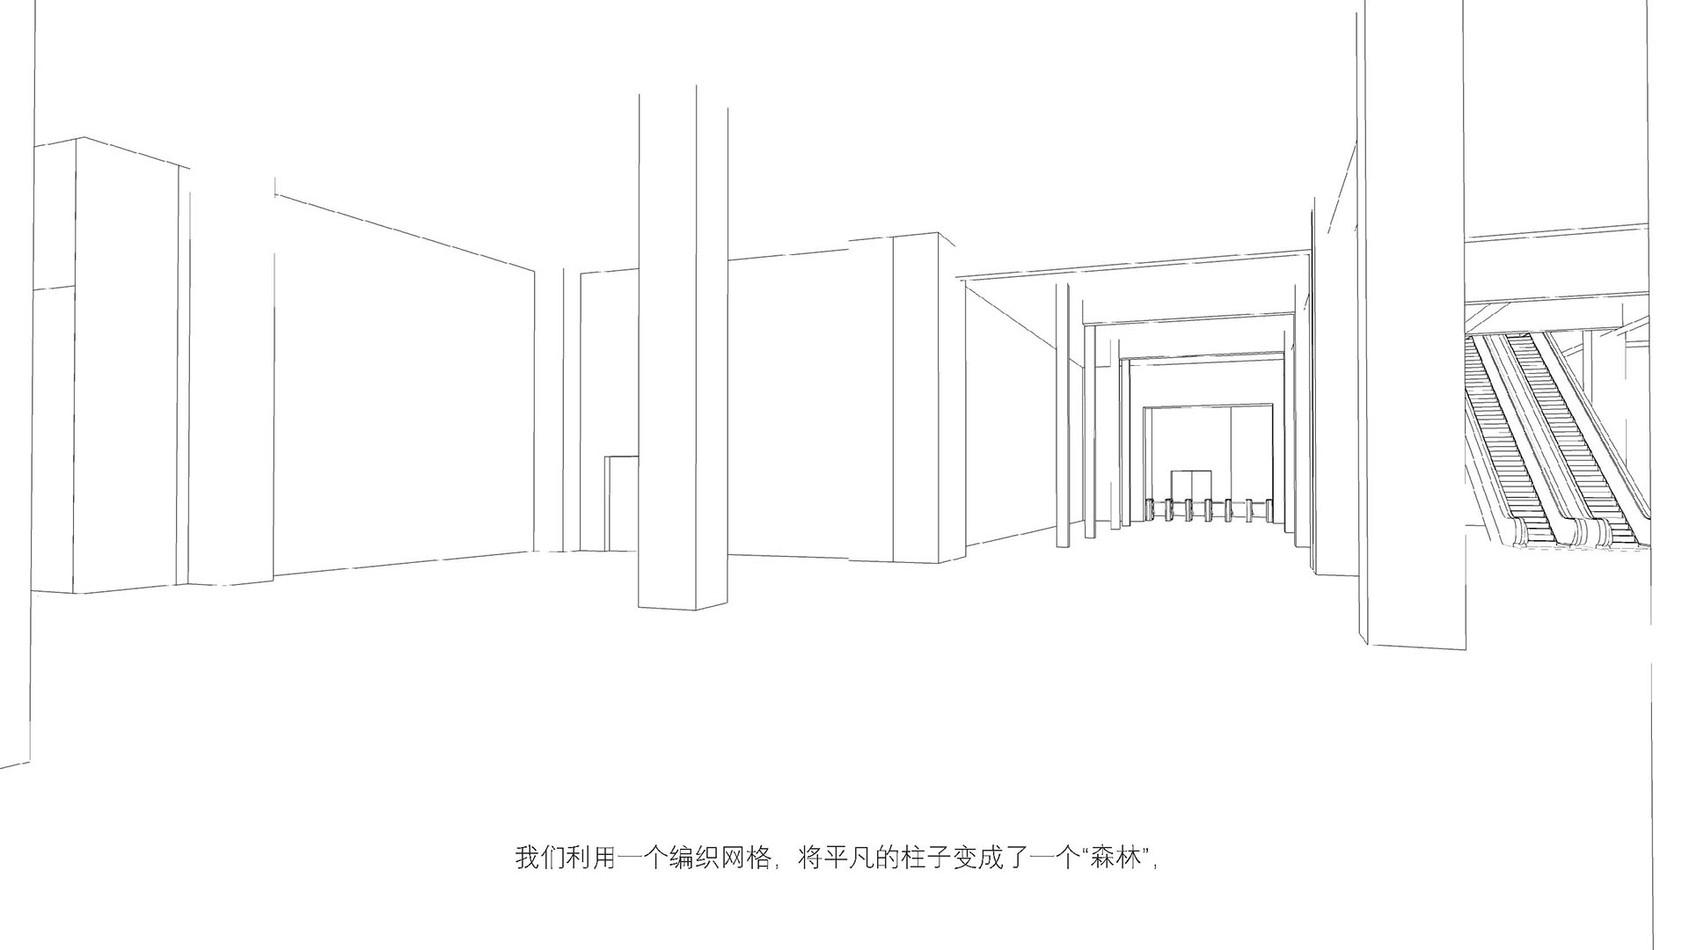 CHONGQING-EMPEROR-CINEMA-ZH 02.jpg